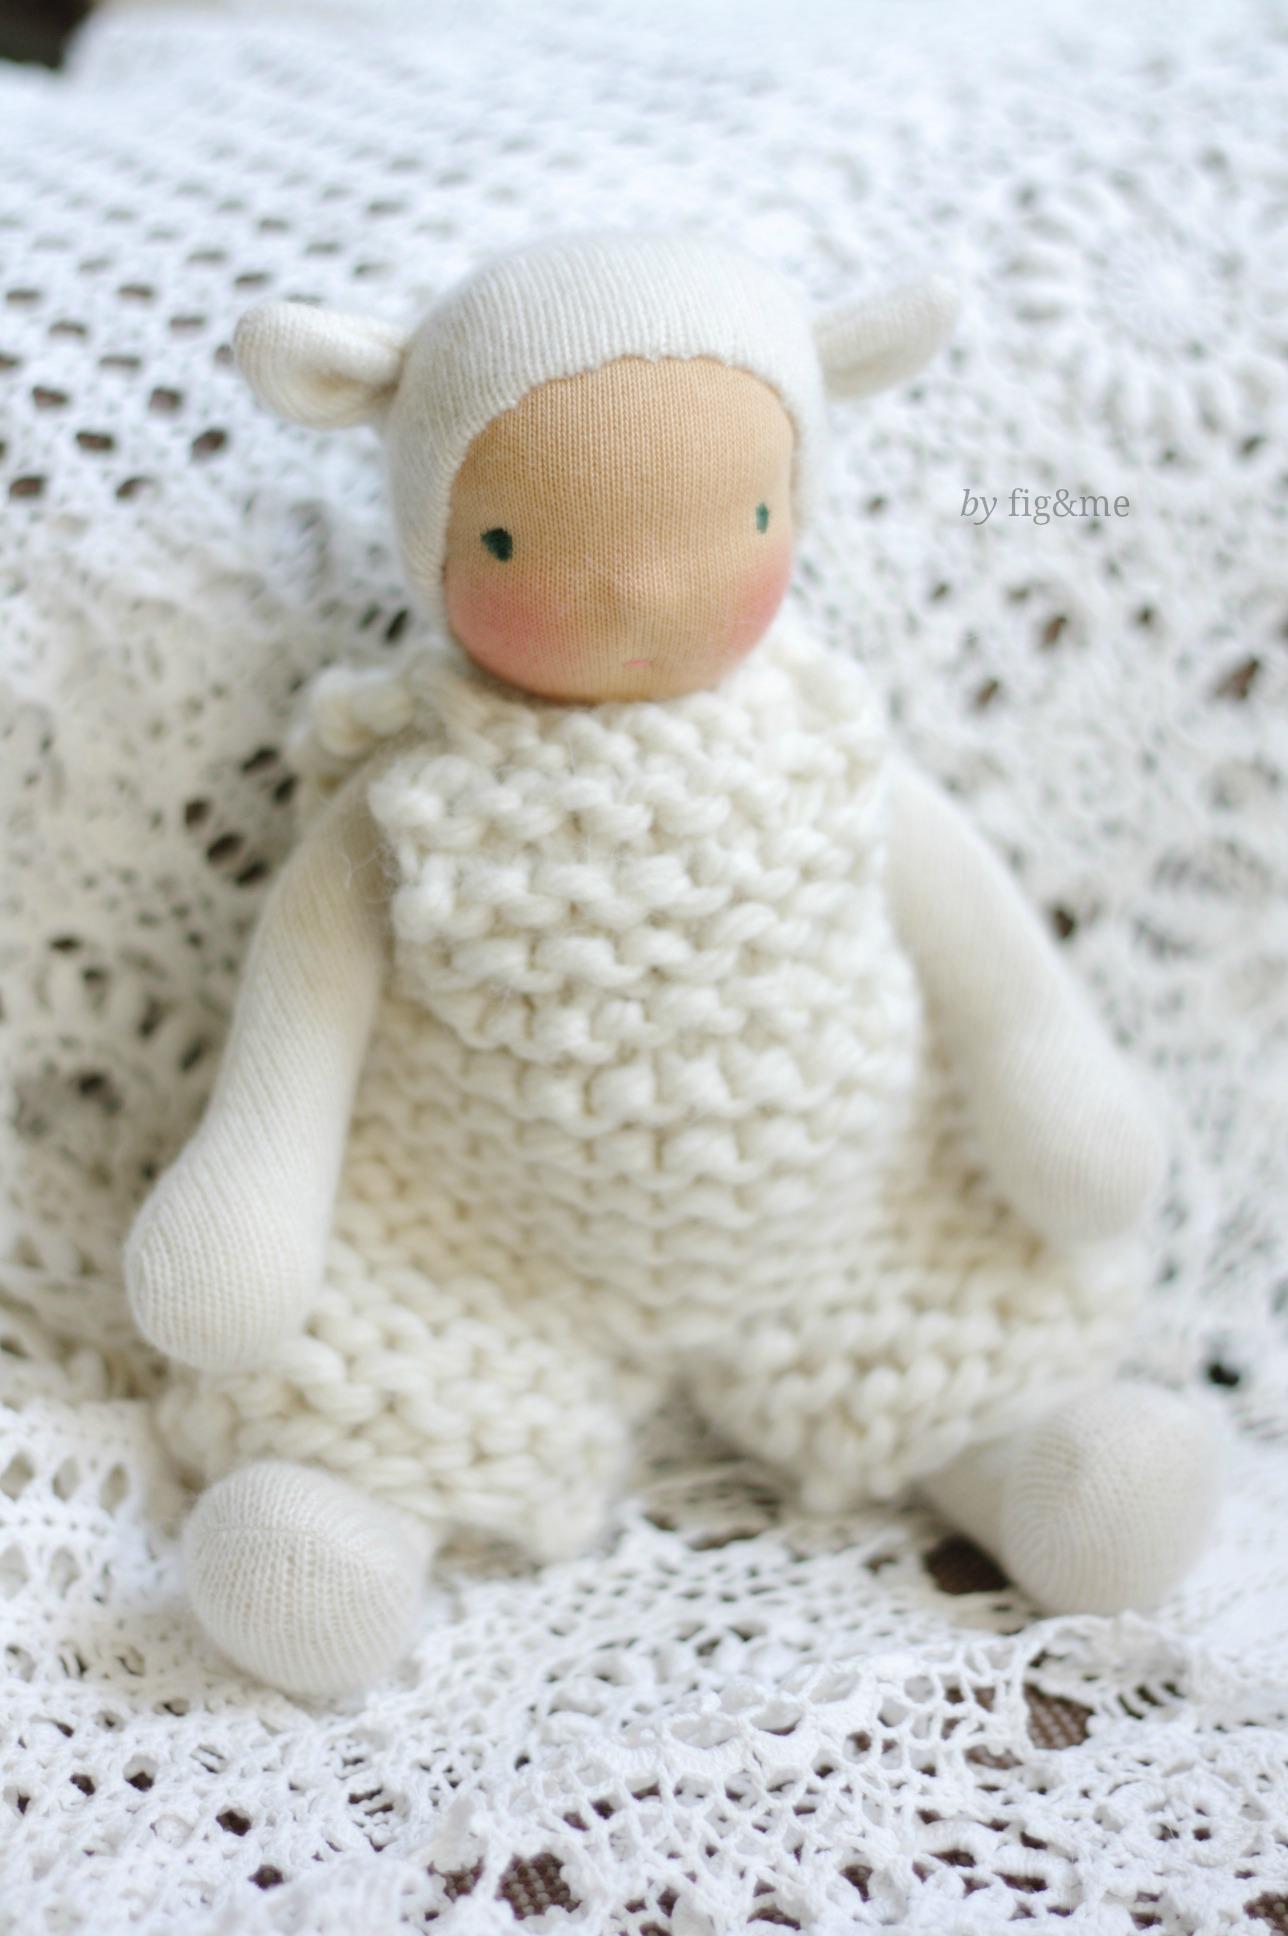 Little Tasha Cheviot, by Fig&me.